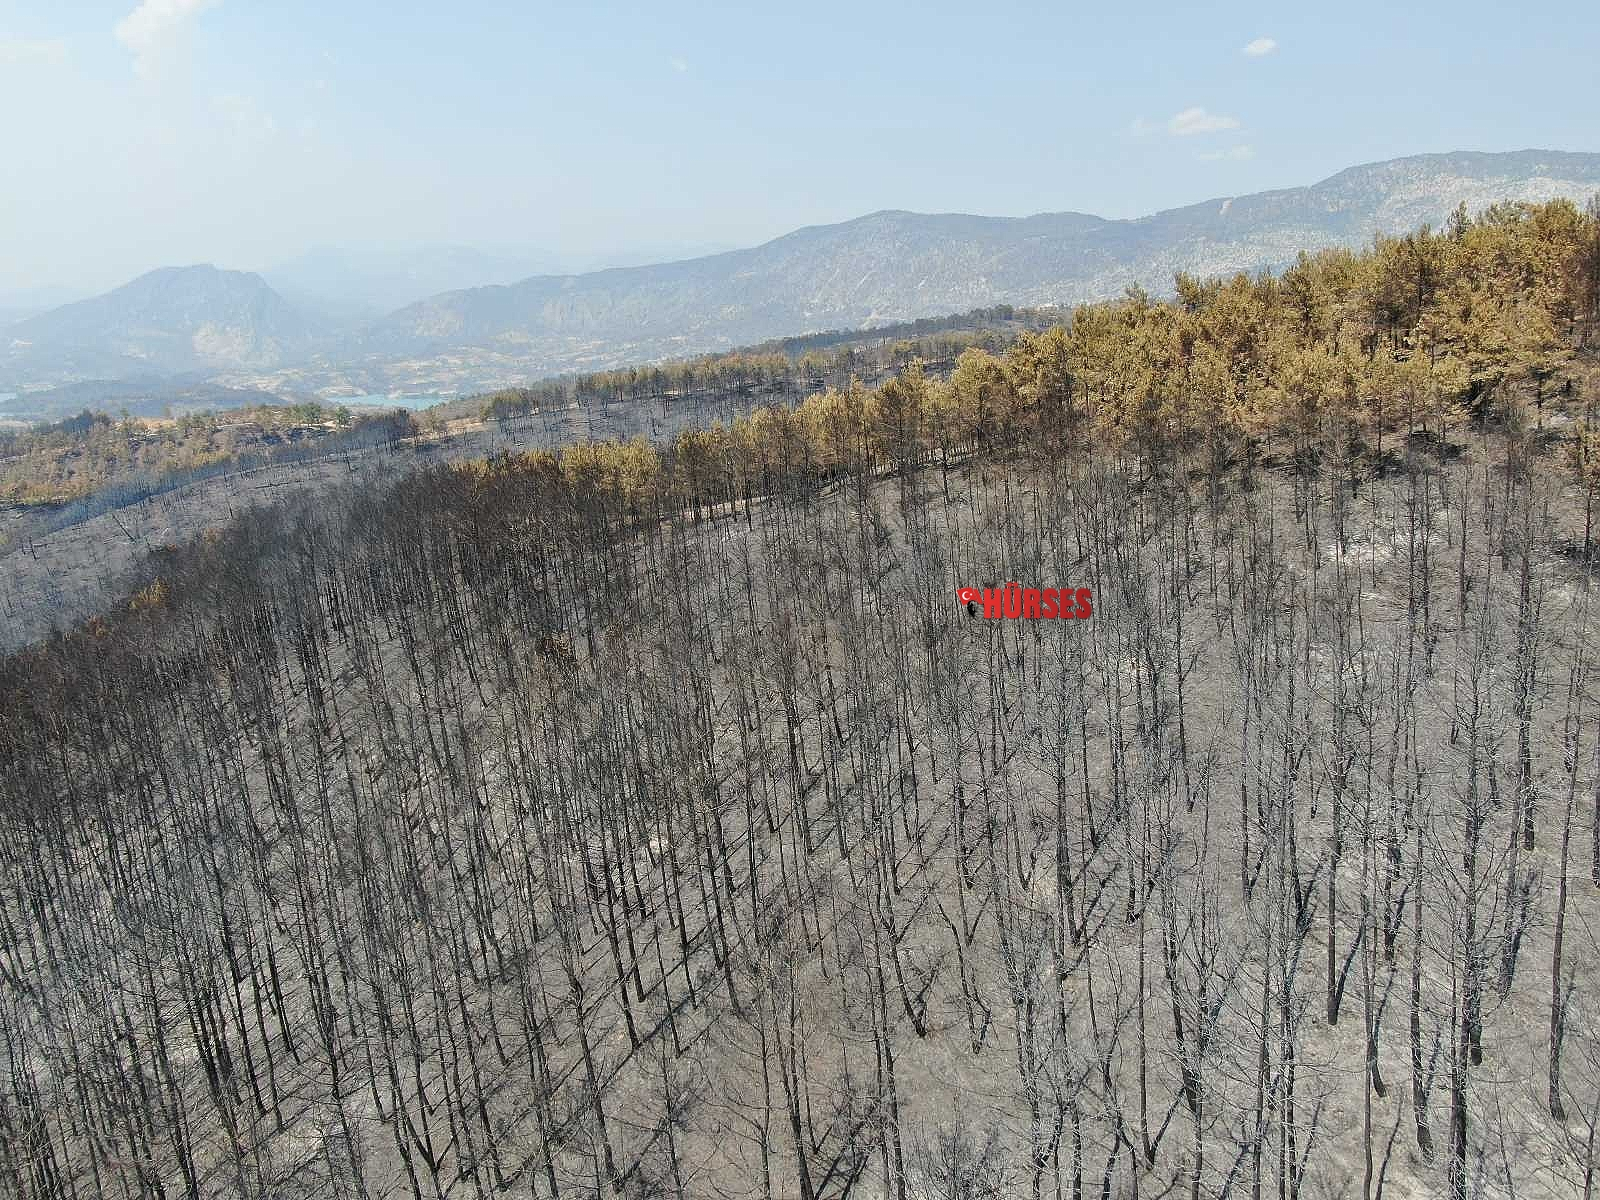 2021/09/manavgatta-yanan-alanlara-keciboynuzu-ekilsin-onerisi-20210923AW42-1.jpg